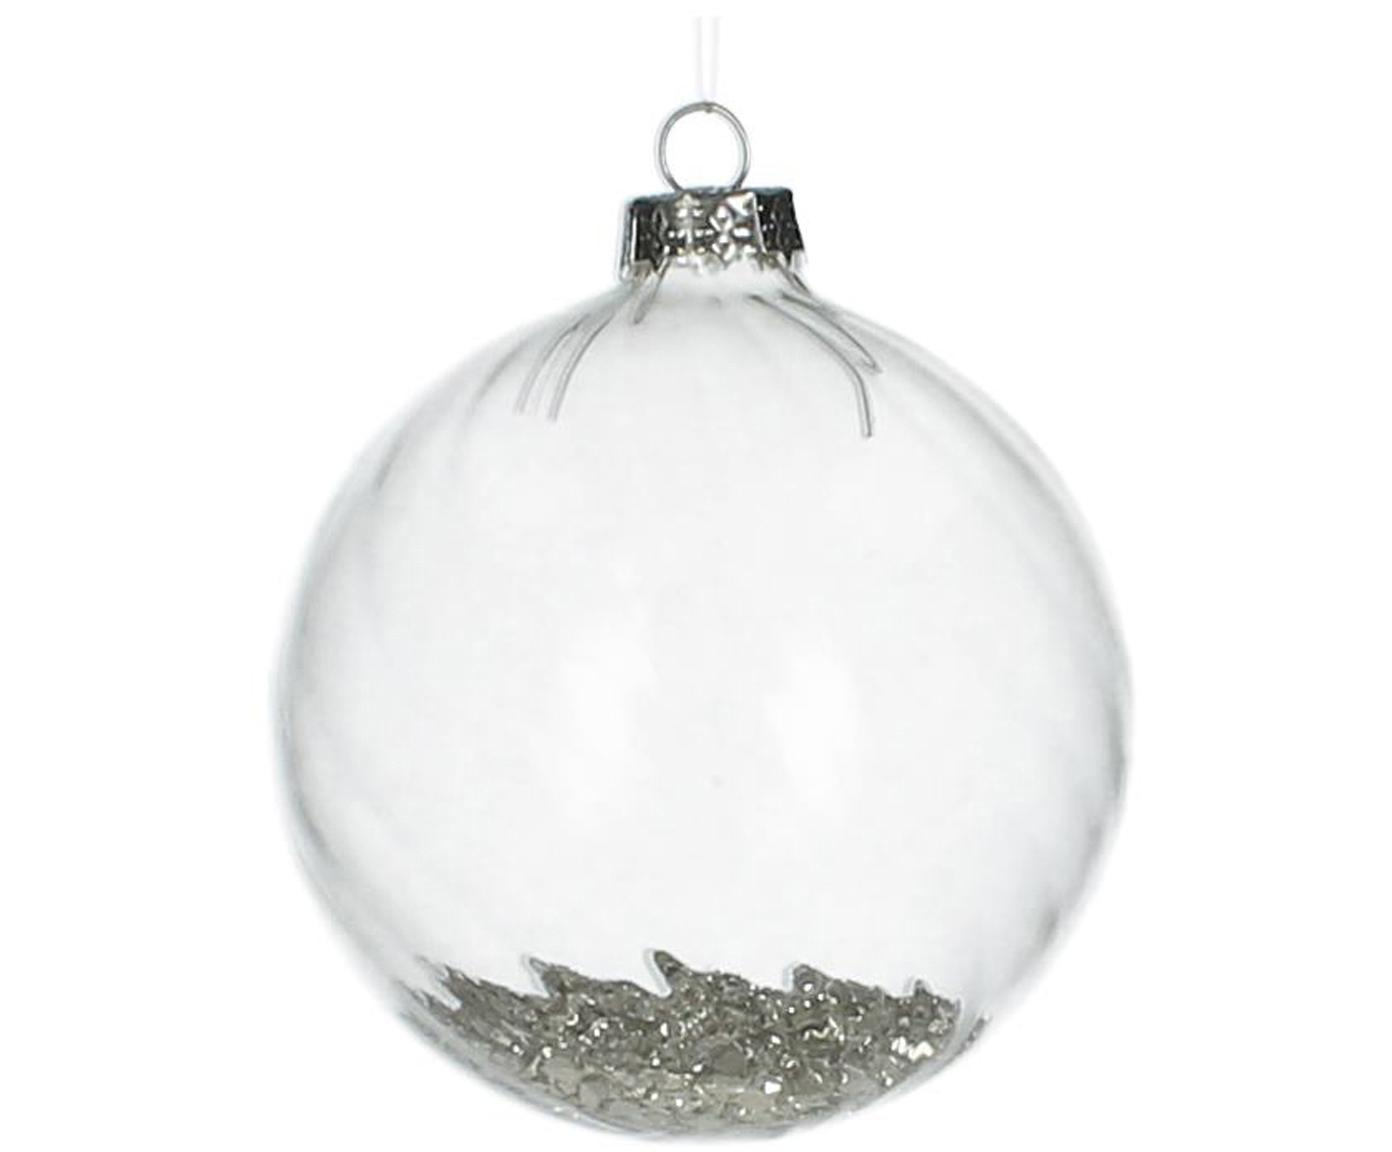 Weihnachtskugeln Rill, 2 Stück, Transparent, Silberfarben, Ø 8 cm